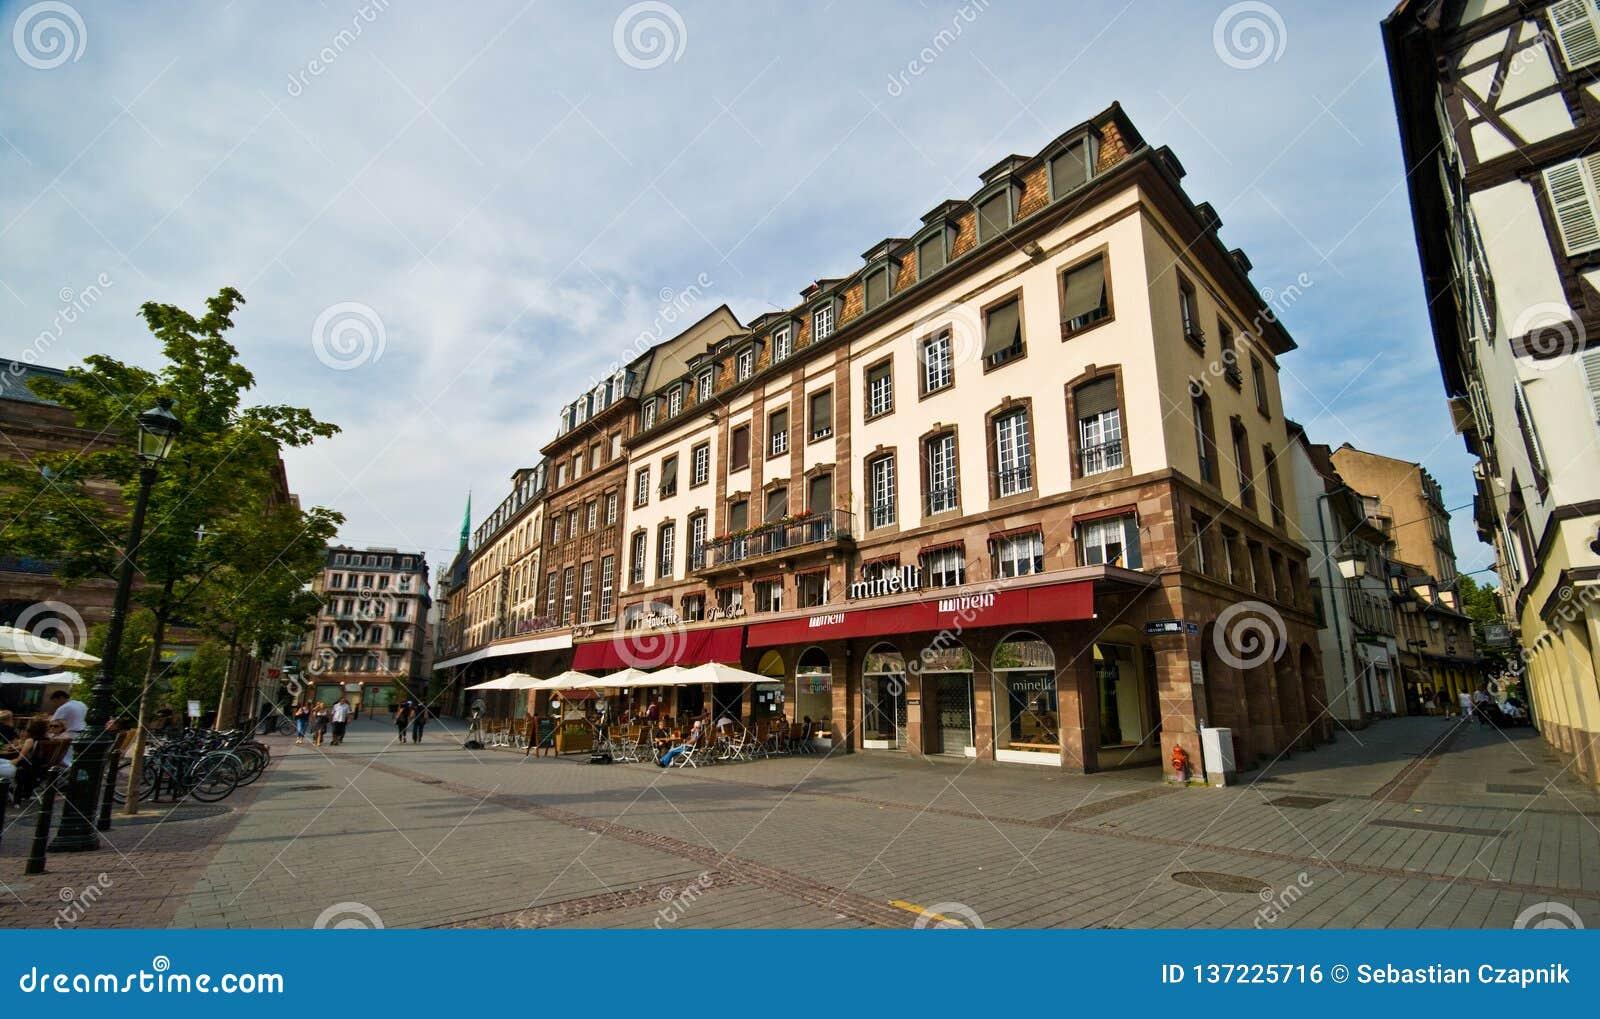 France Strasborg urban architecture in summer